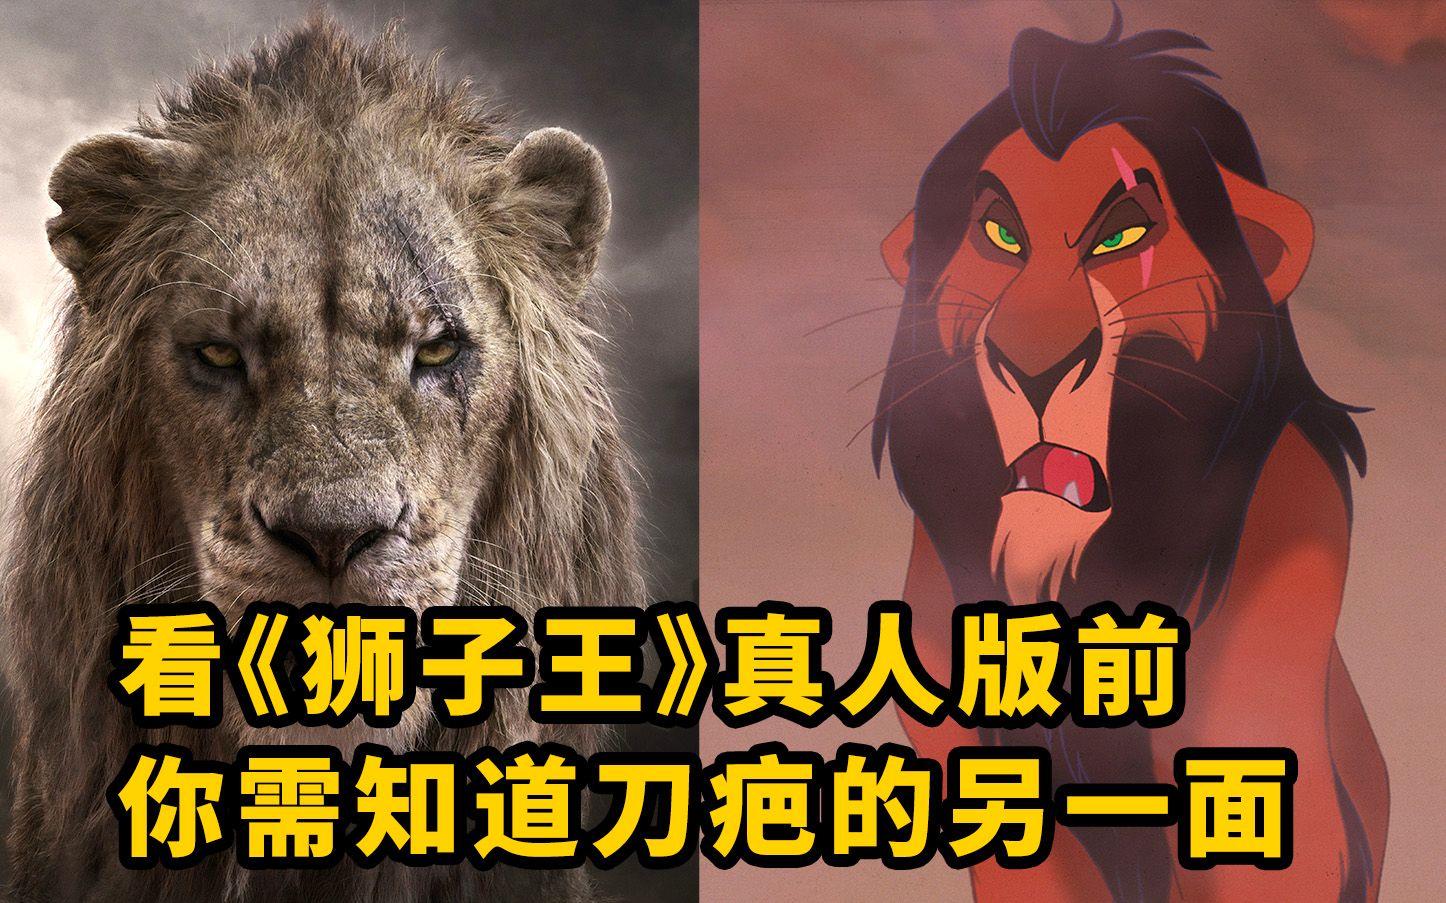 真人版《獅子王》觀影指南,神還原真的好嗎?_嗶哩嗶哩 (゜-゜)つロ 干杯~-bilibili